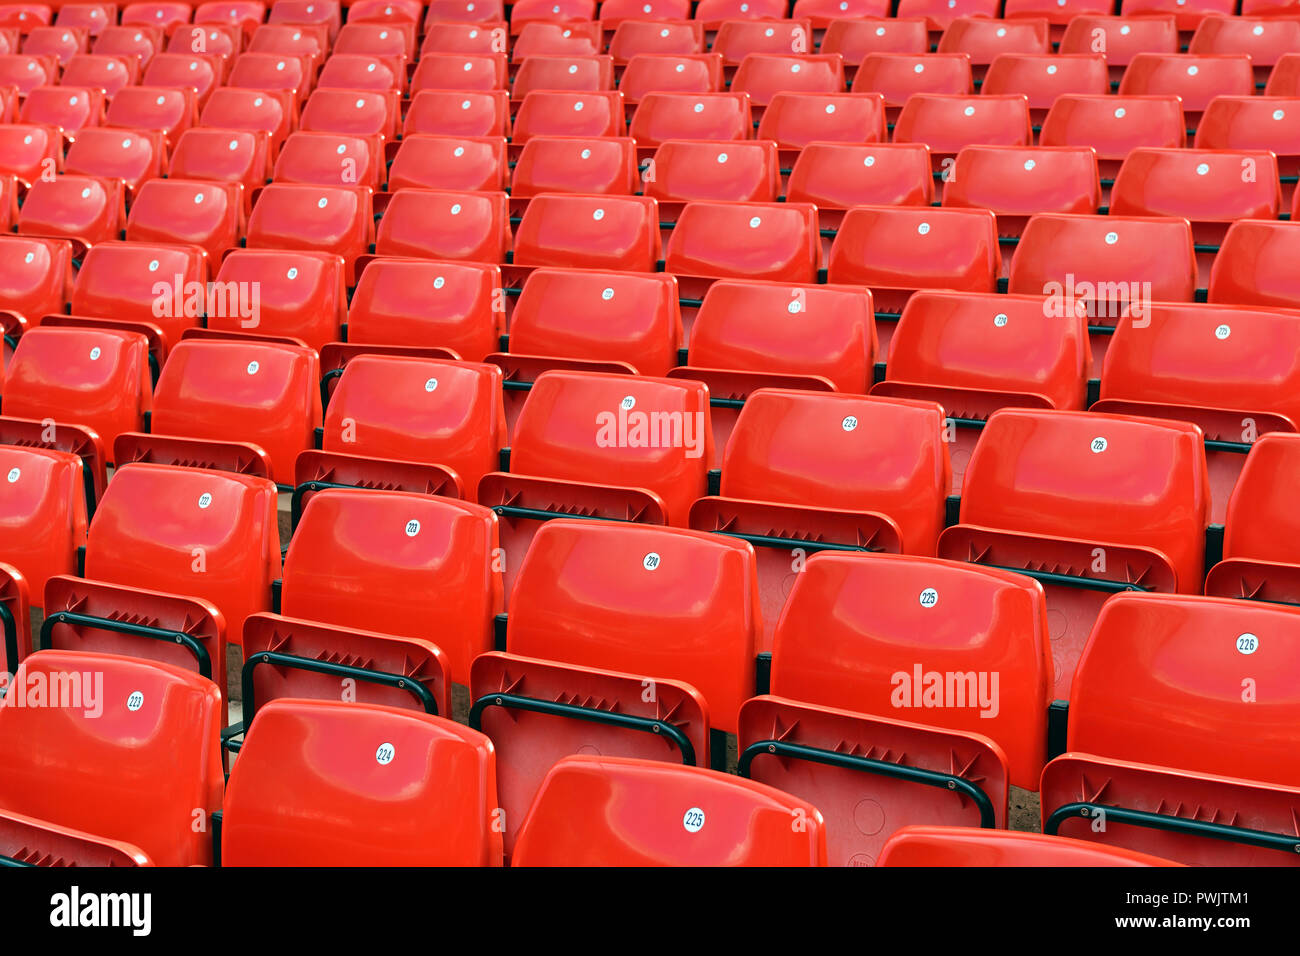 Stadium Seating, Rows of Empty Seats, UK Stock Photo